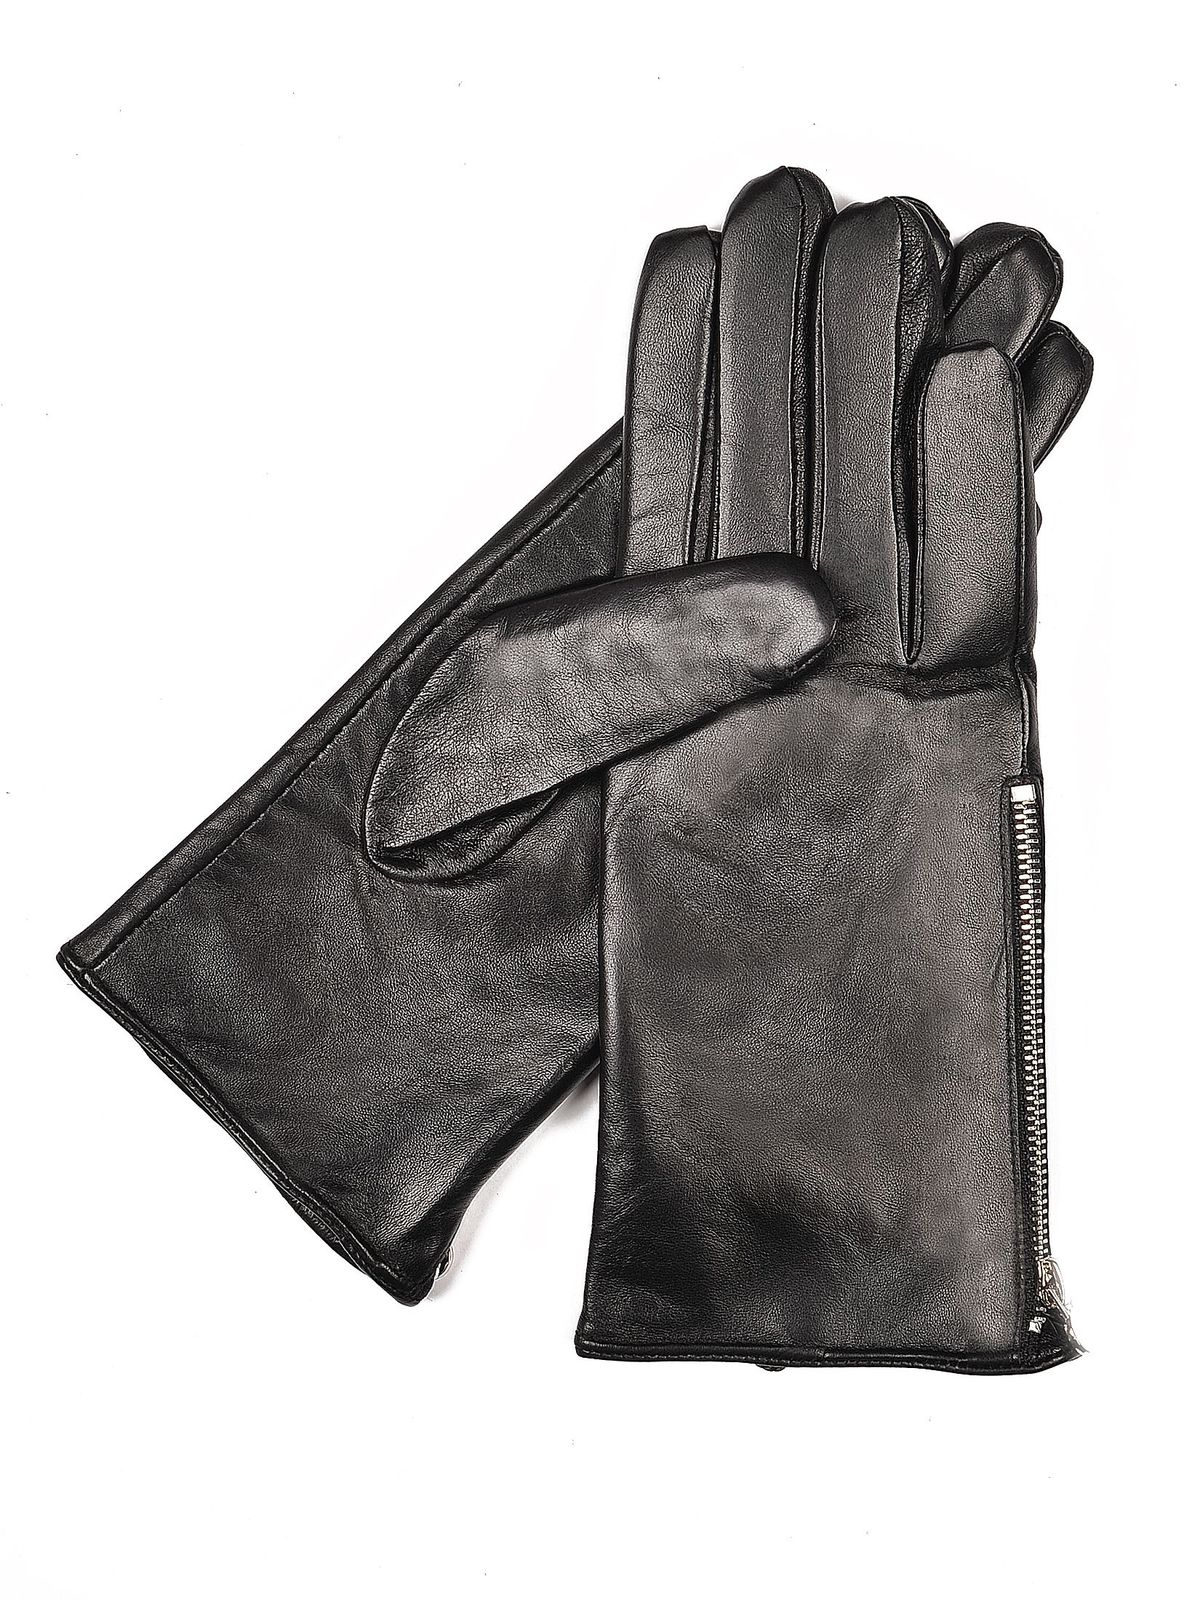 TOP SECRET δερματινα γαντια.